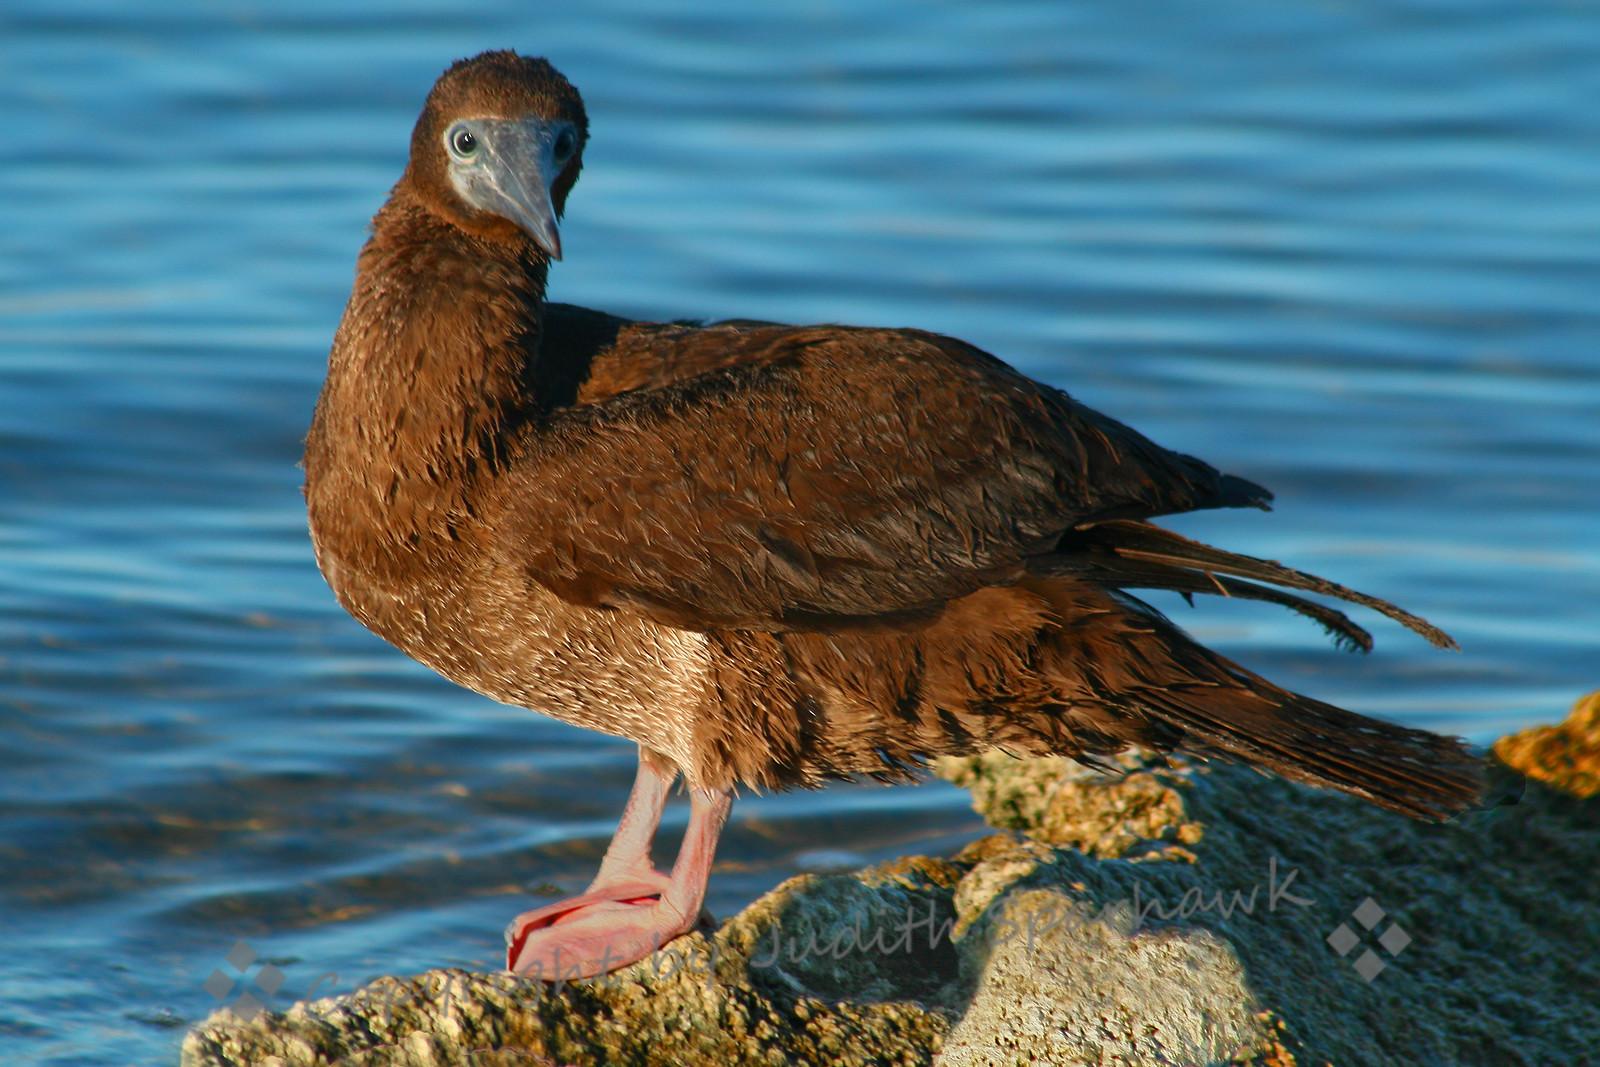 Here's Lookin' At You ~ Juvenile Brown Booby, Salton Sea, California, 9/3/10.